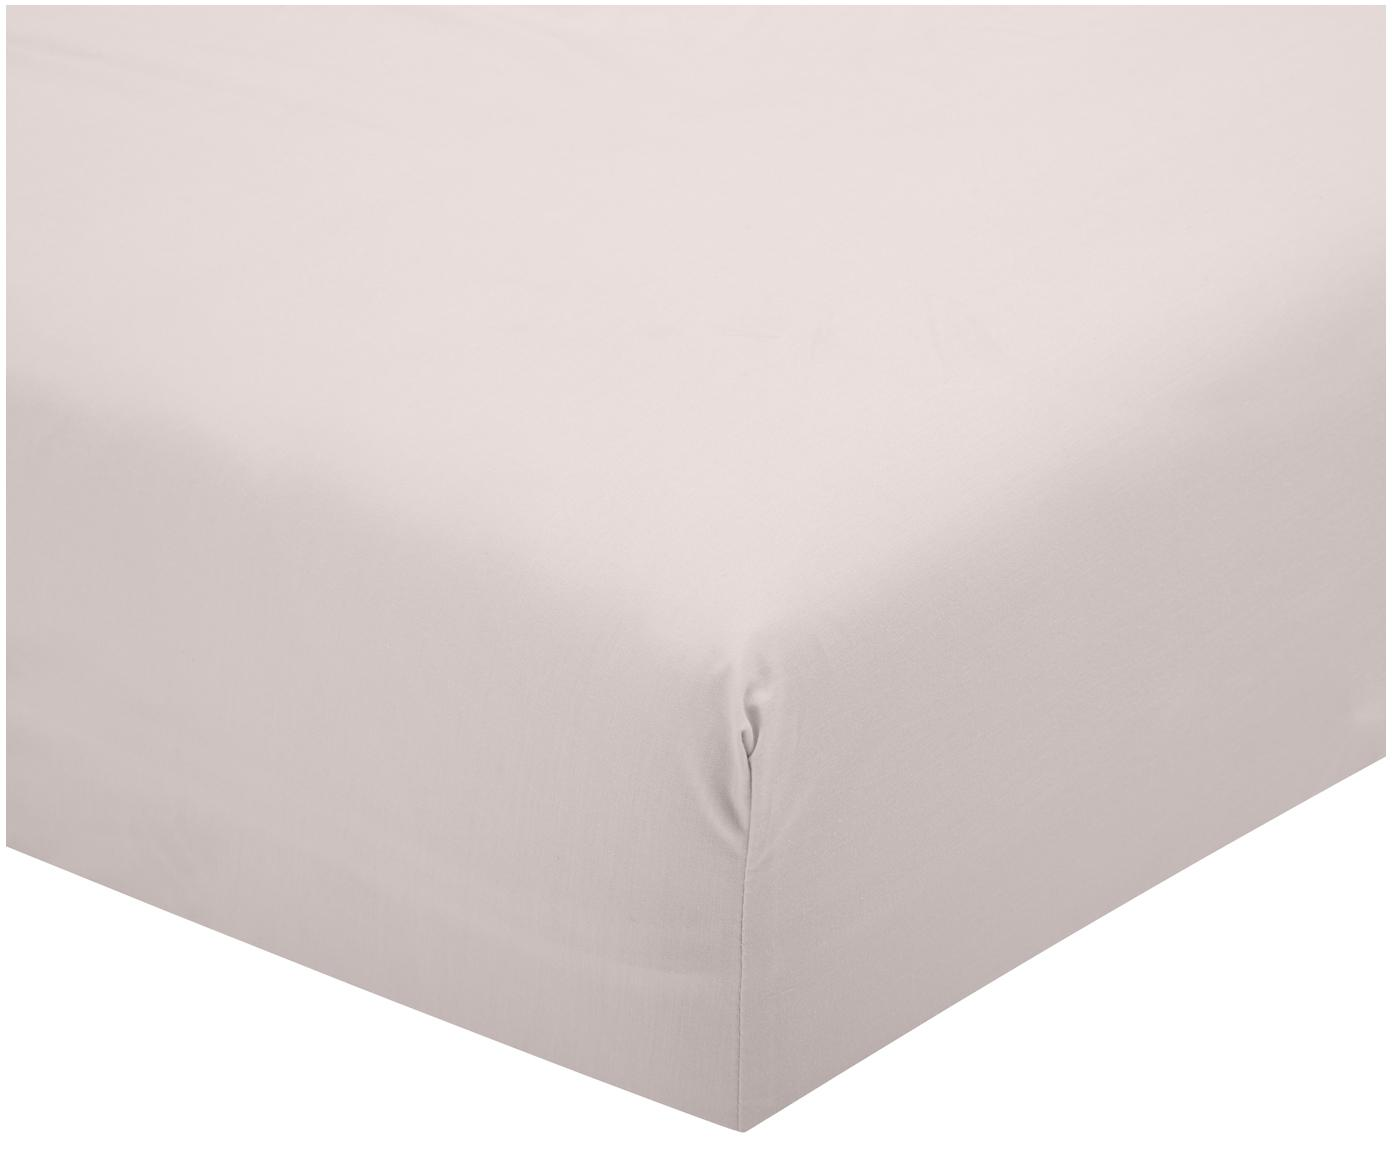 Lenzuolo con angoli in percalle Elsie, Tessuto: percalle, Rosa, 140 x 200 cm